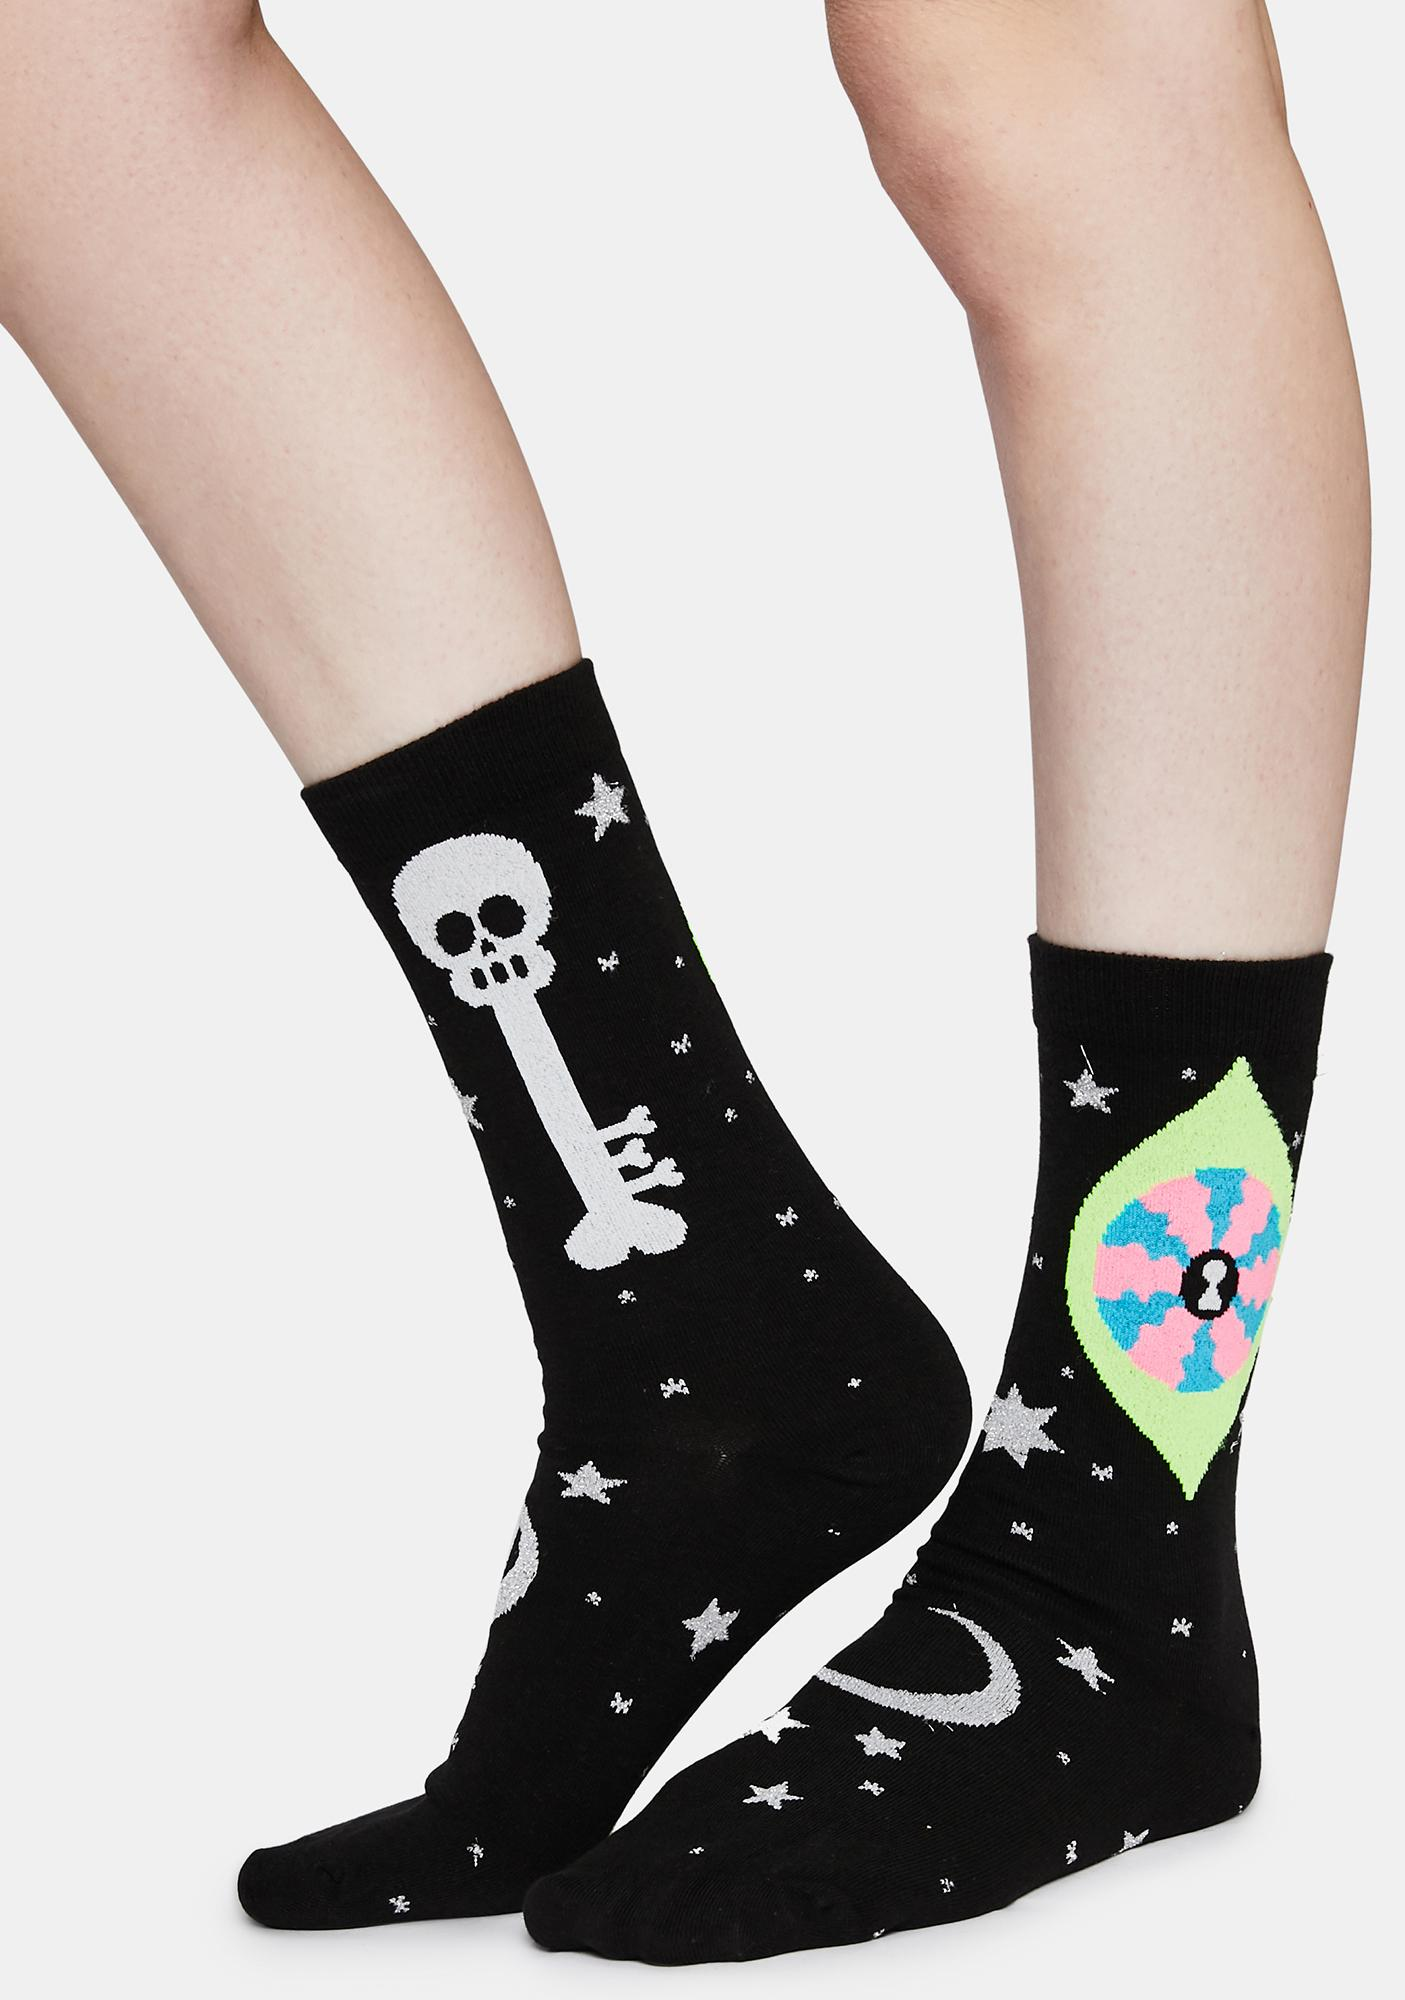 Gumball Poodle Oliver's Eye Crew Socks